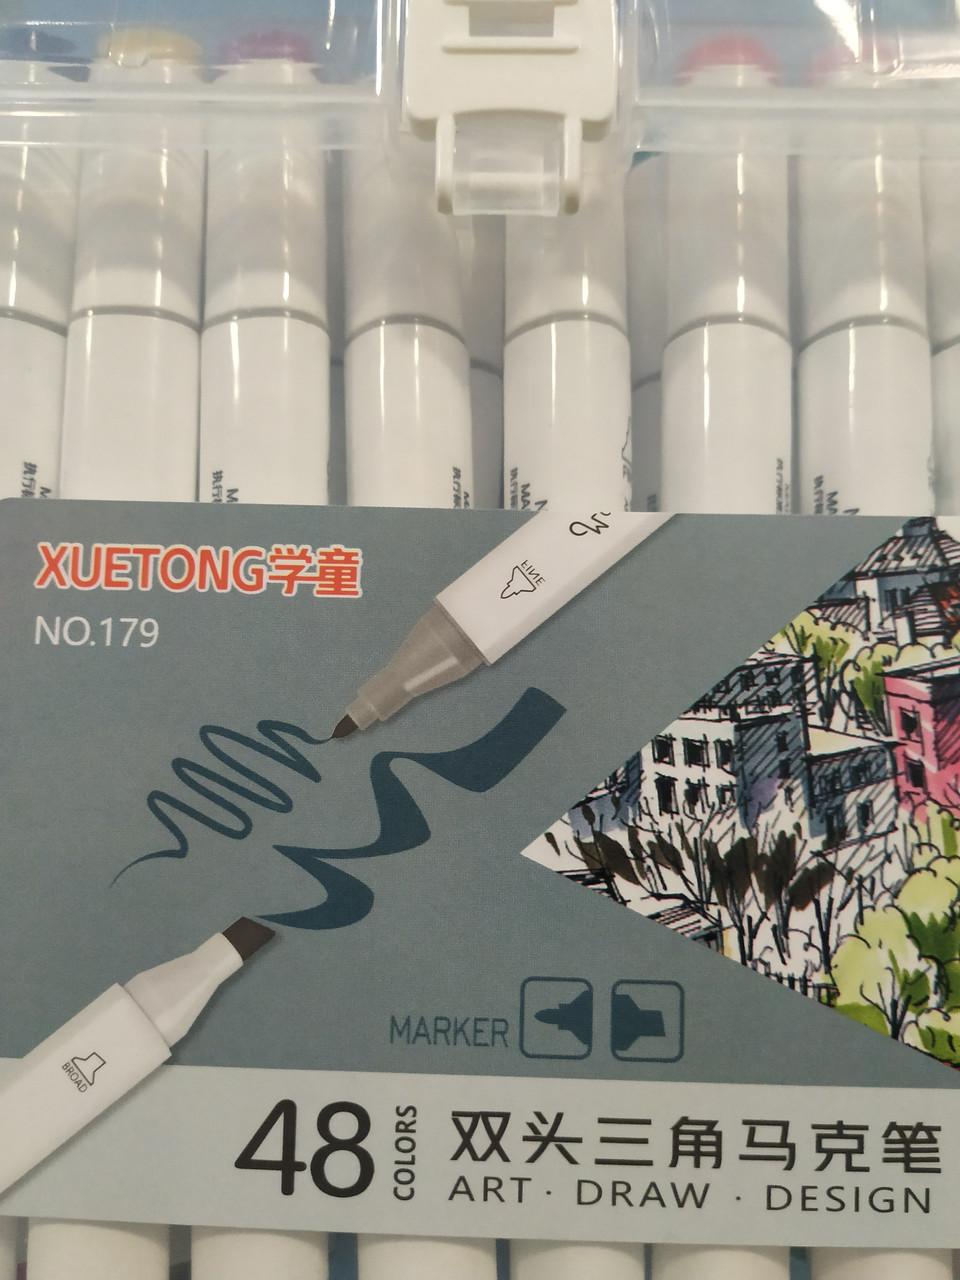 Художественные маркеры для скетчинга TOUCH mark 48 шт, АКЦИЯ!!!!Алматы - фото 3